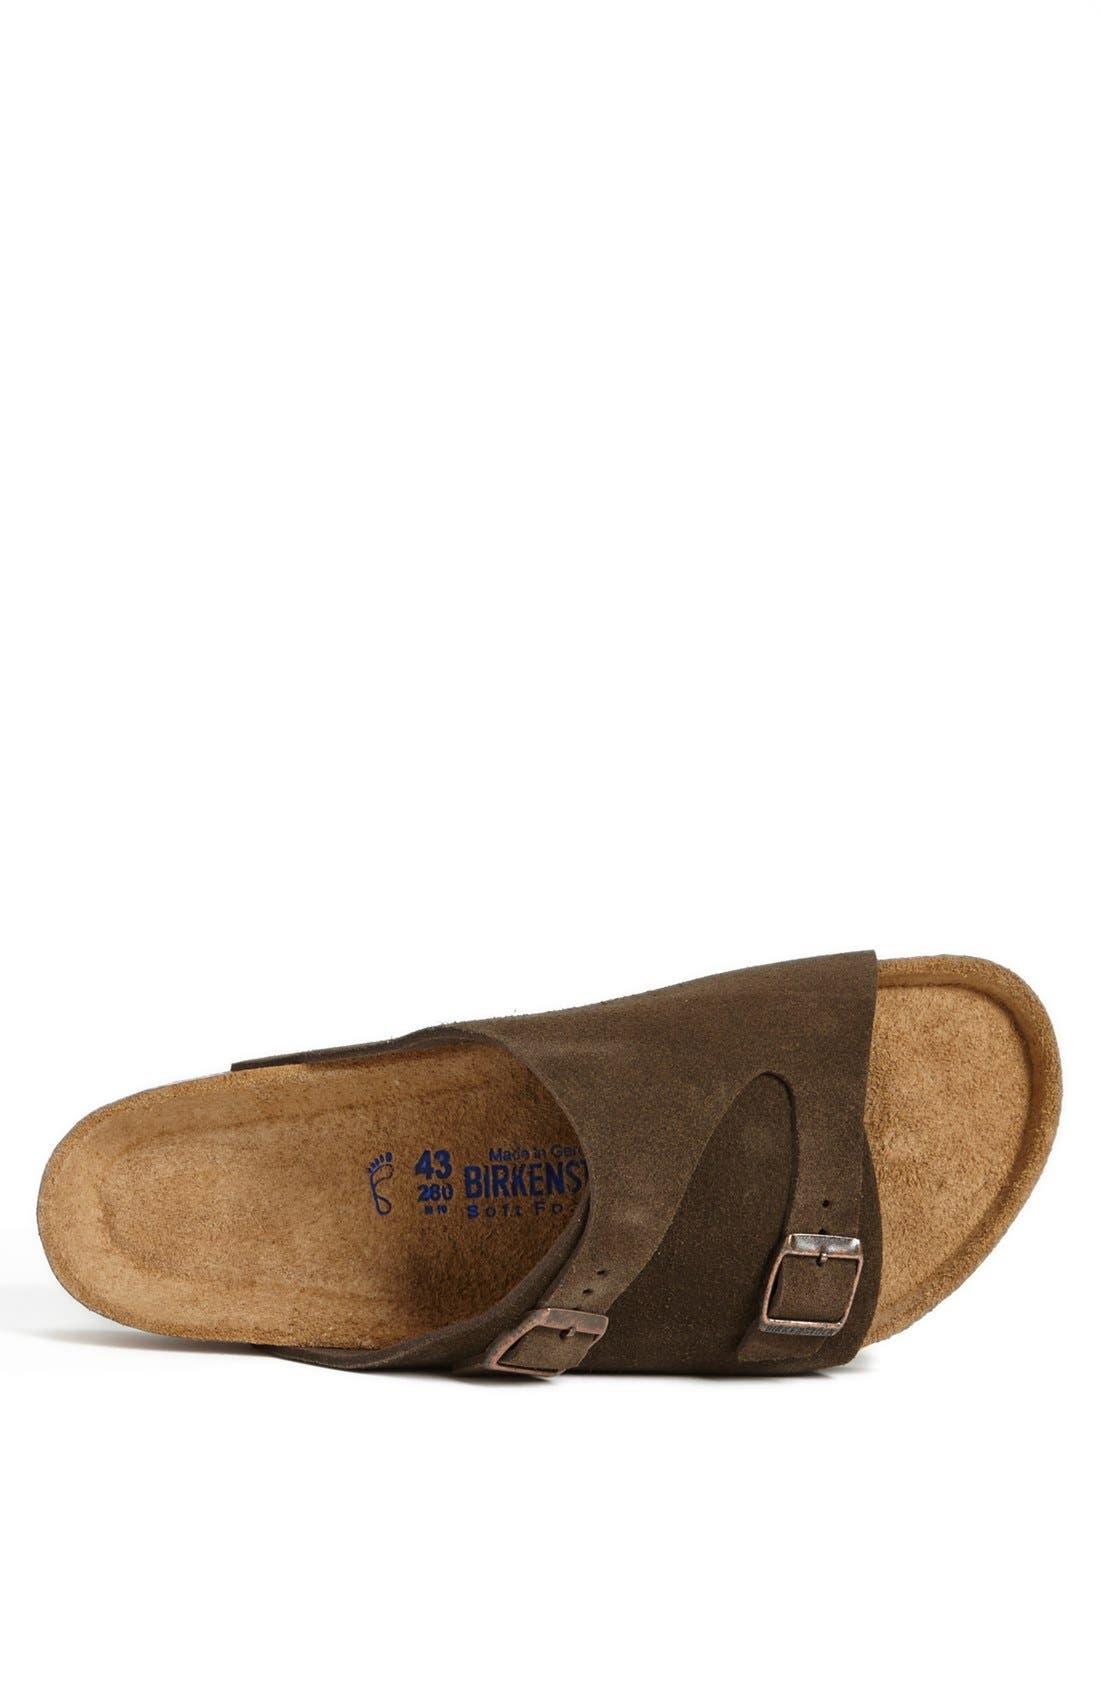 Alternate Image 3  - Birkenstock 'Zürich Soft' Sandal (Men)